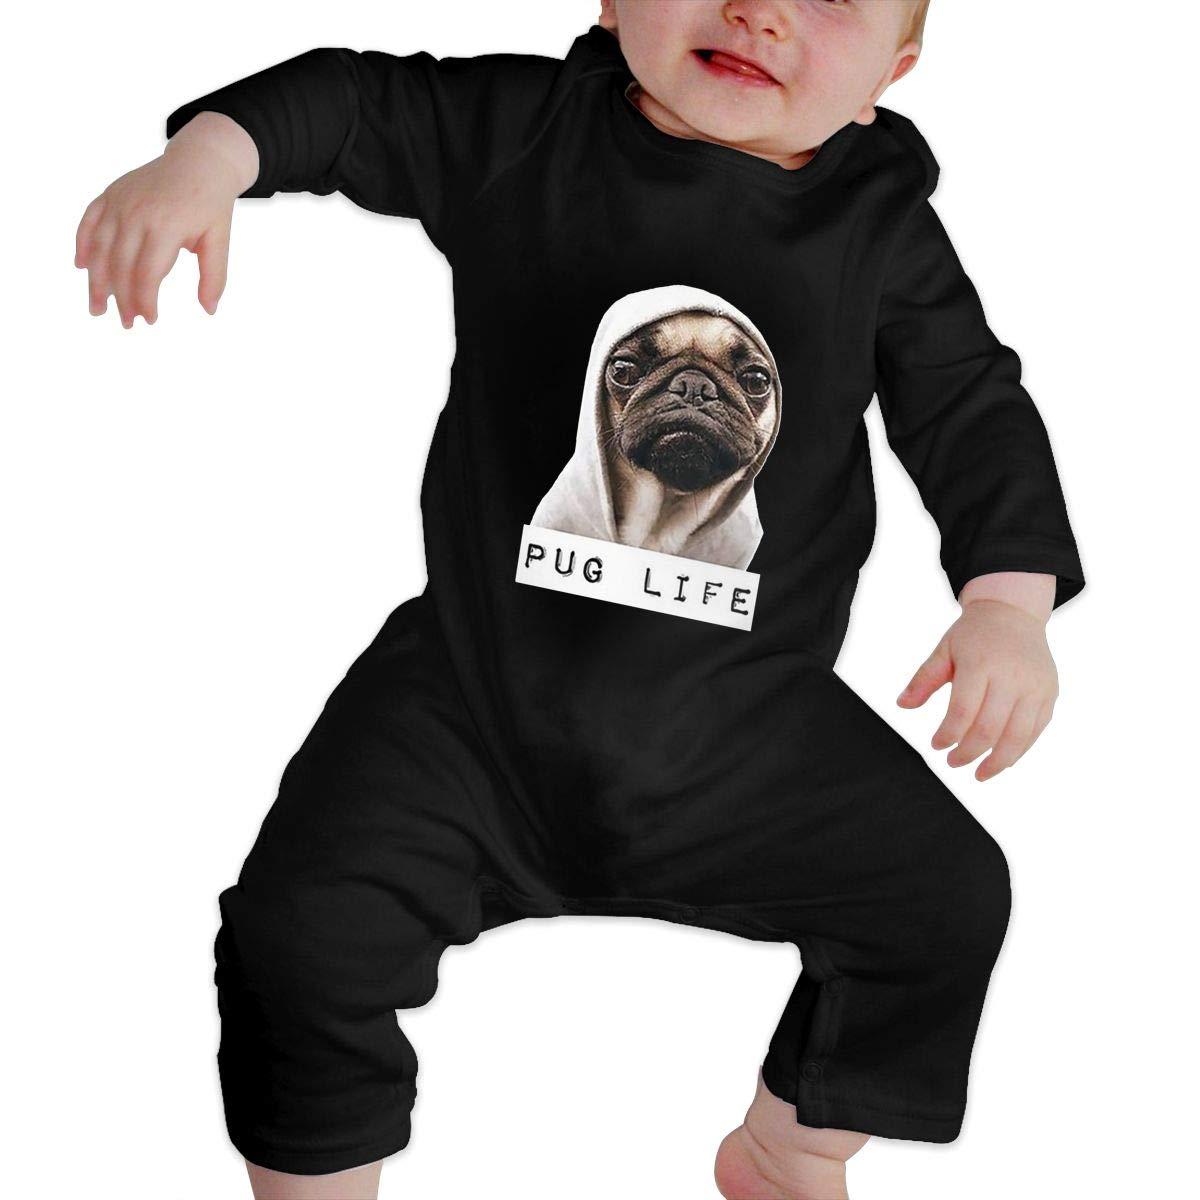 KAYERDELLE Colorful Tartan Long Sleeve Unisex Baby Romper for 6-24 Months Boys /& Girls